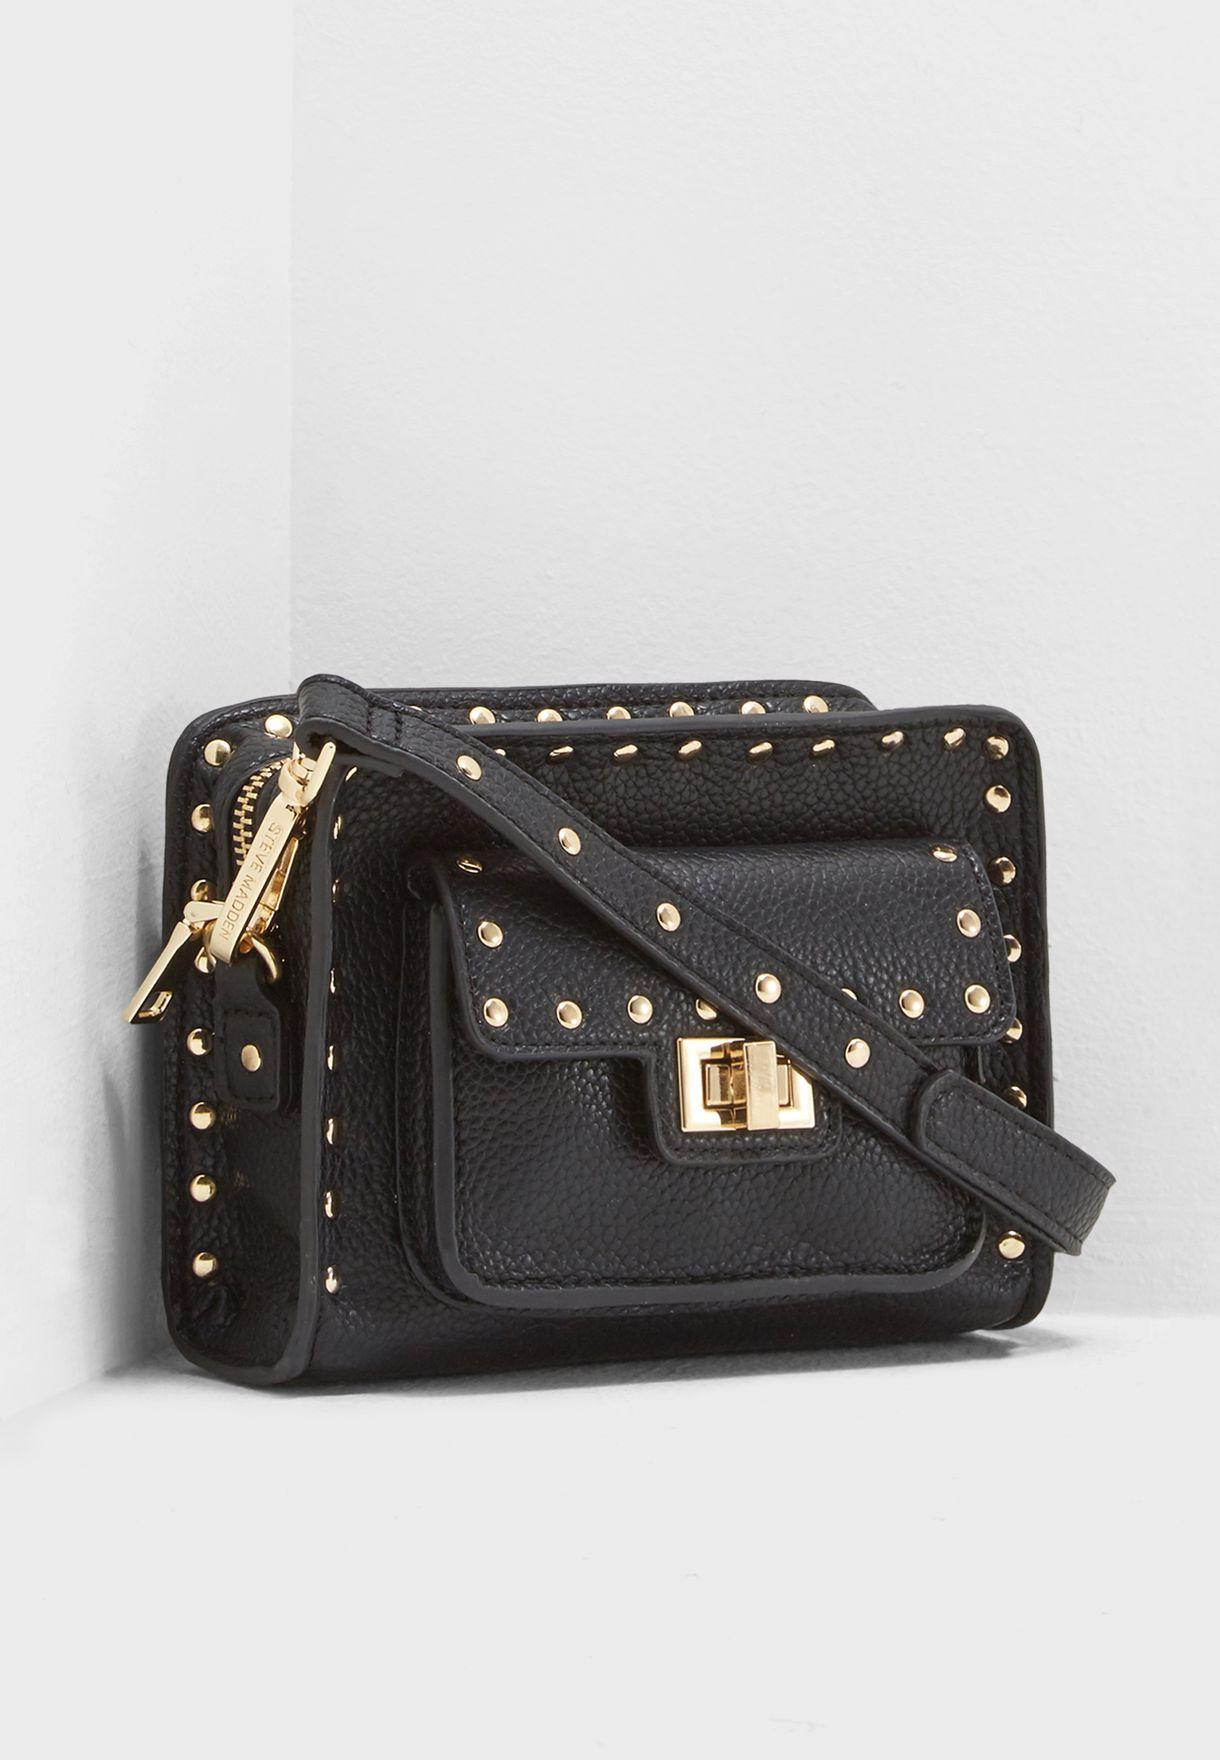 e27a7ba45f Shop Steve Madden black Studded Valentino Crossbody BJANA for Women ...